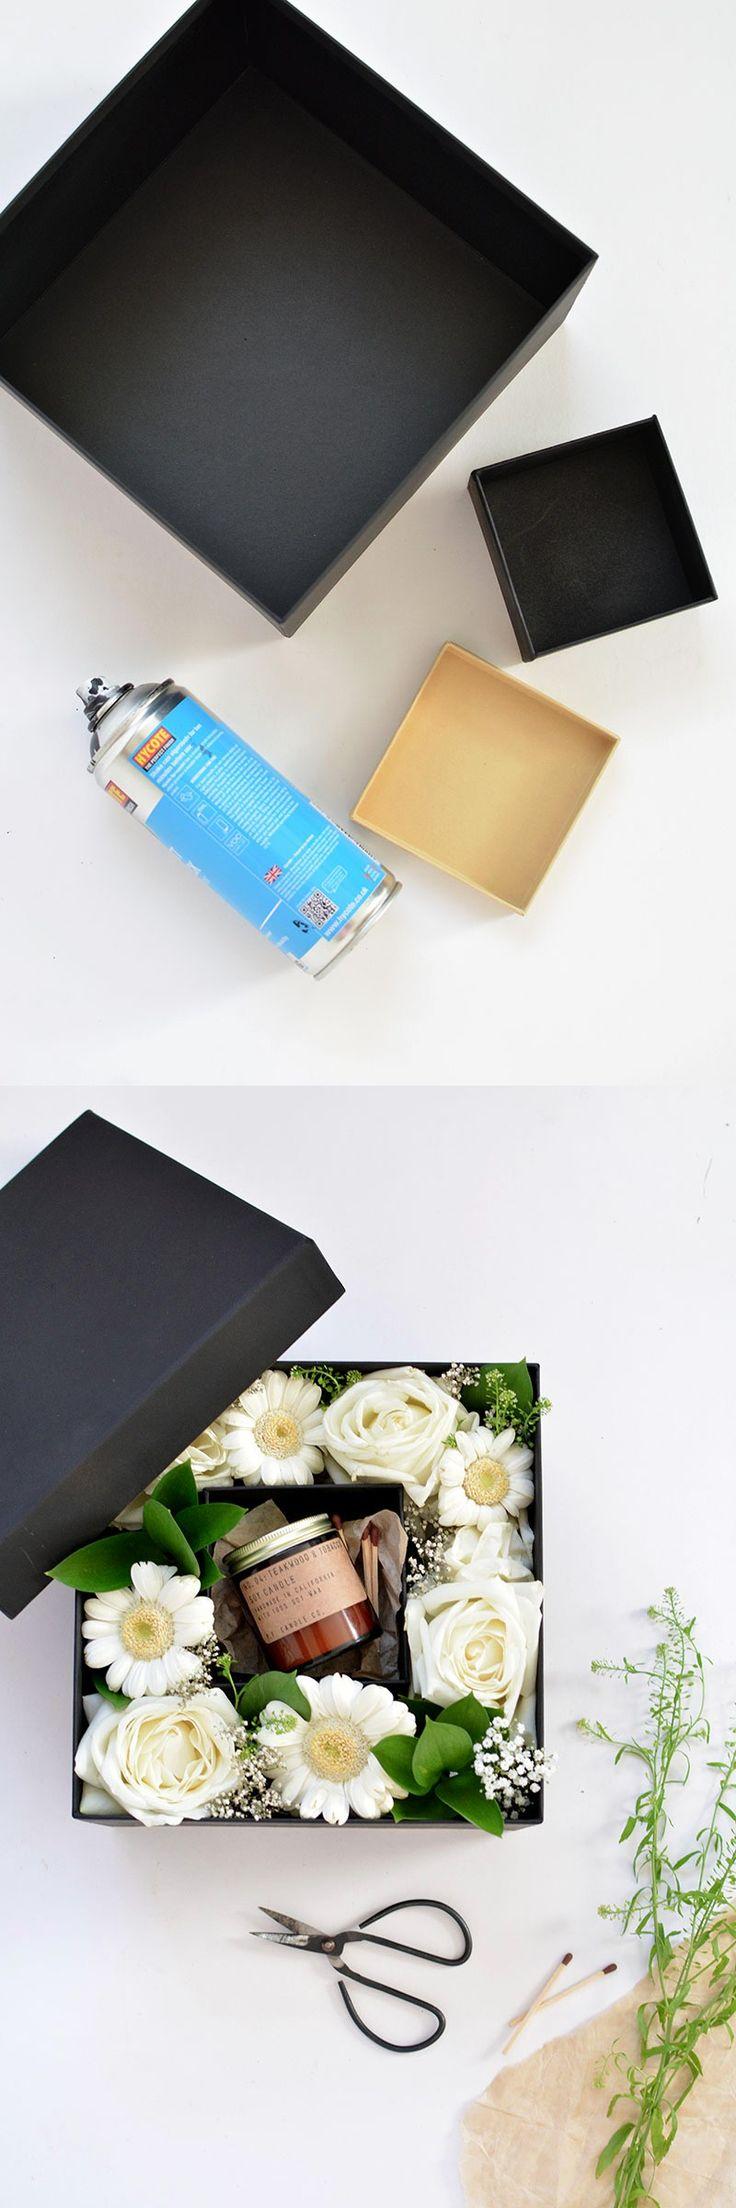 Lindo regalo DIY para madrina de boda